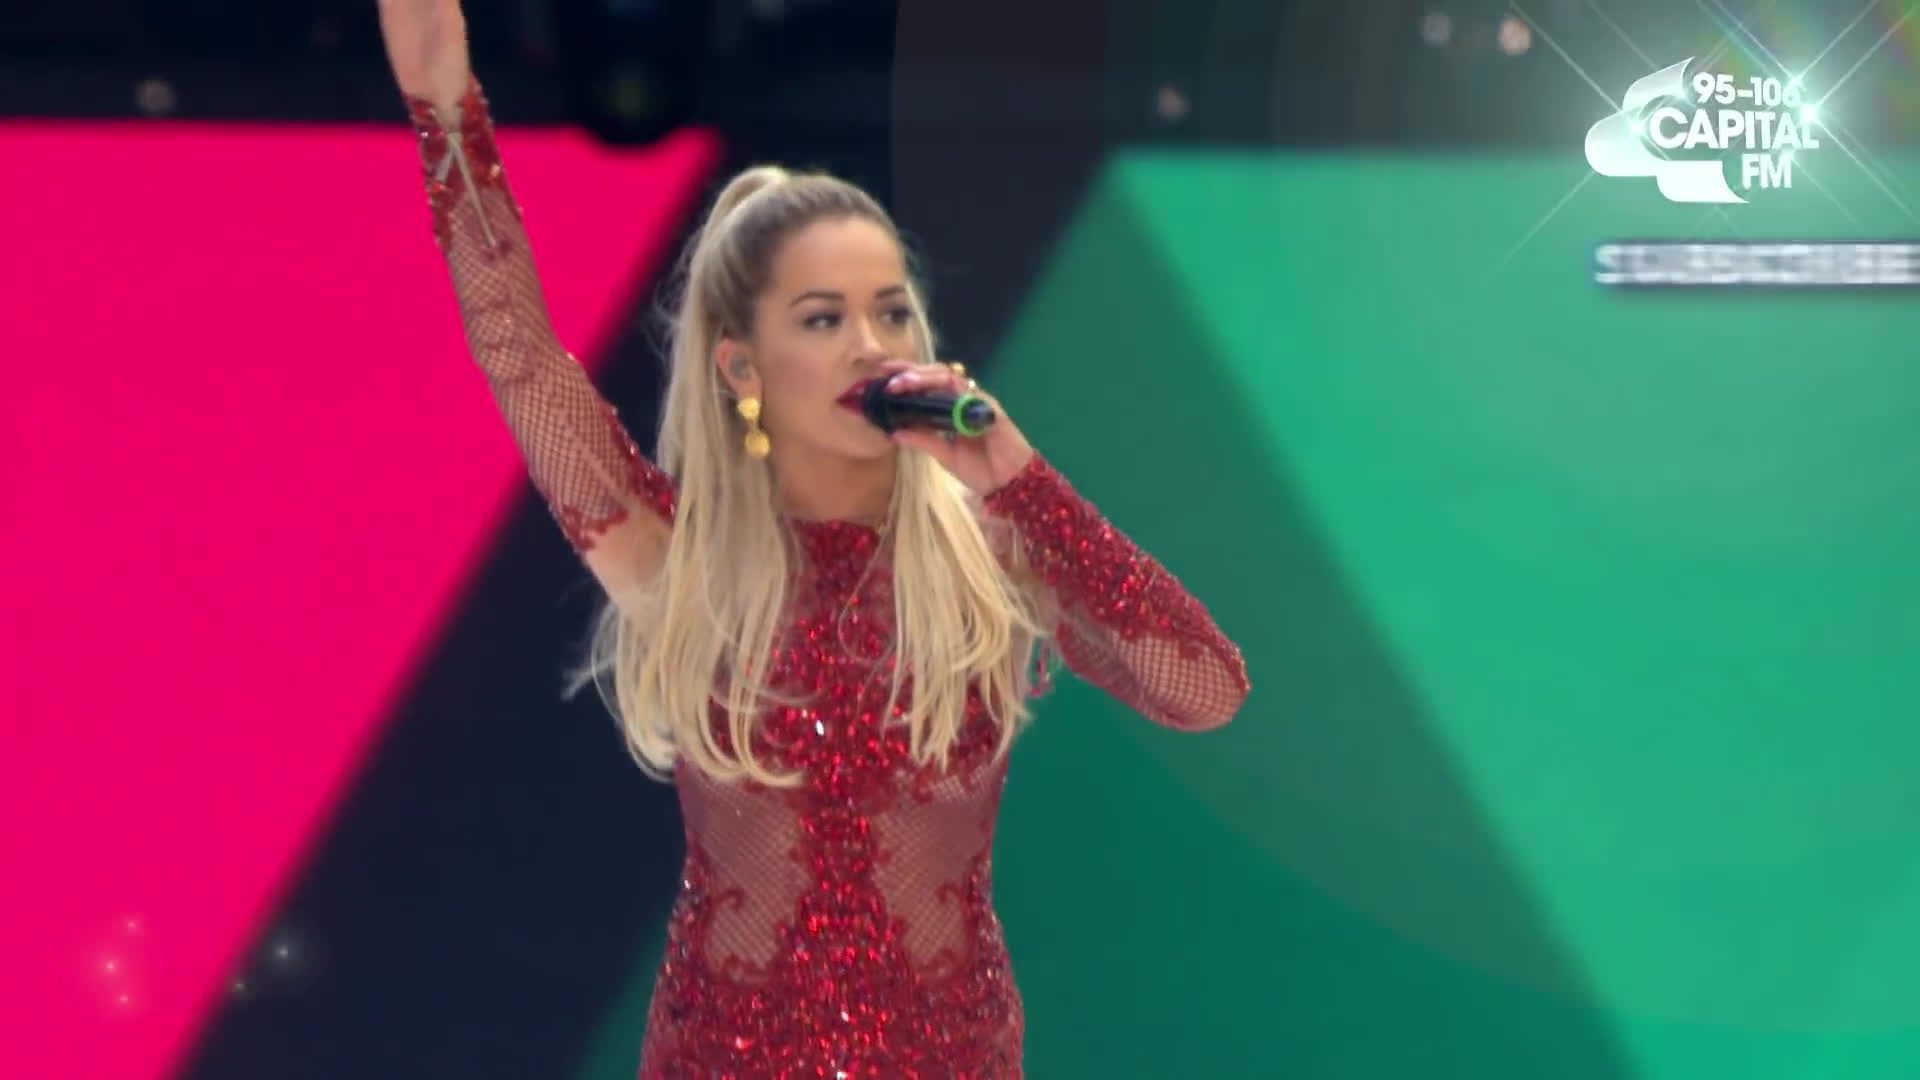 capital, capital fm, capitalfmofficial, Rita Ora - I Will Never Let You Down (Summertime Ball 2014) GIFs